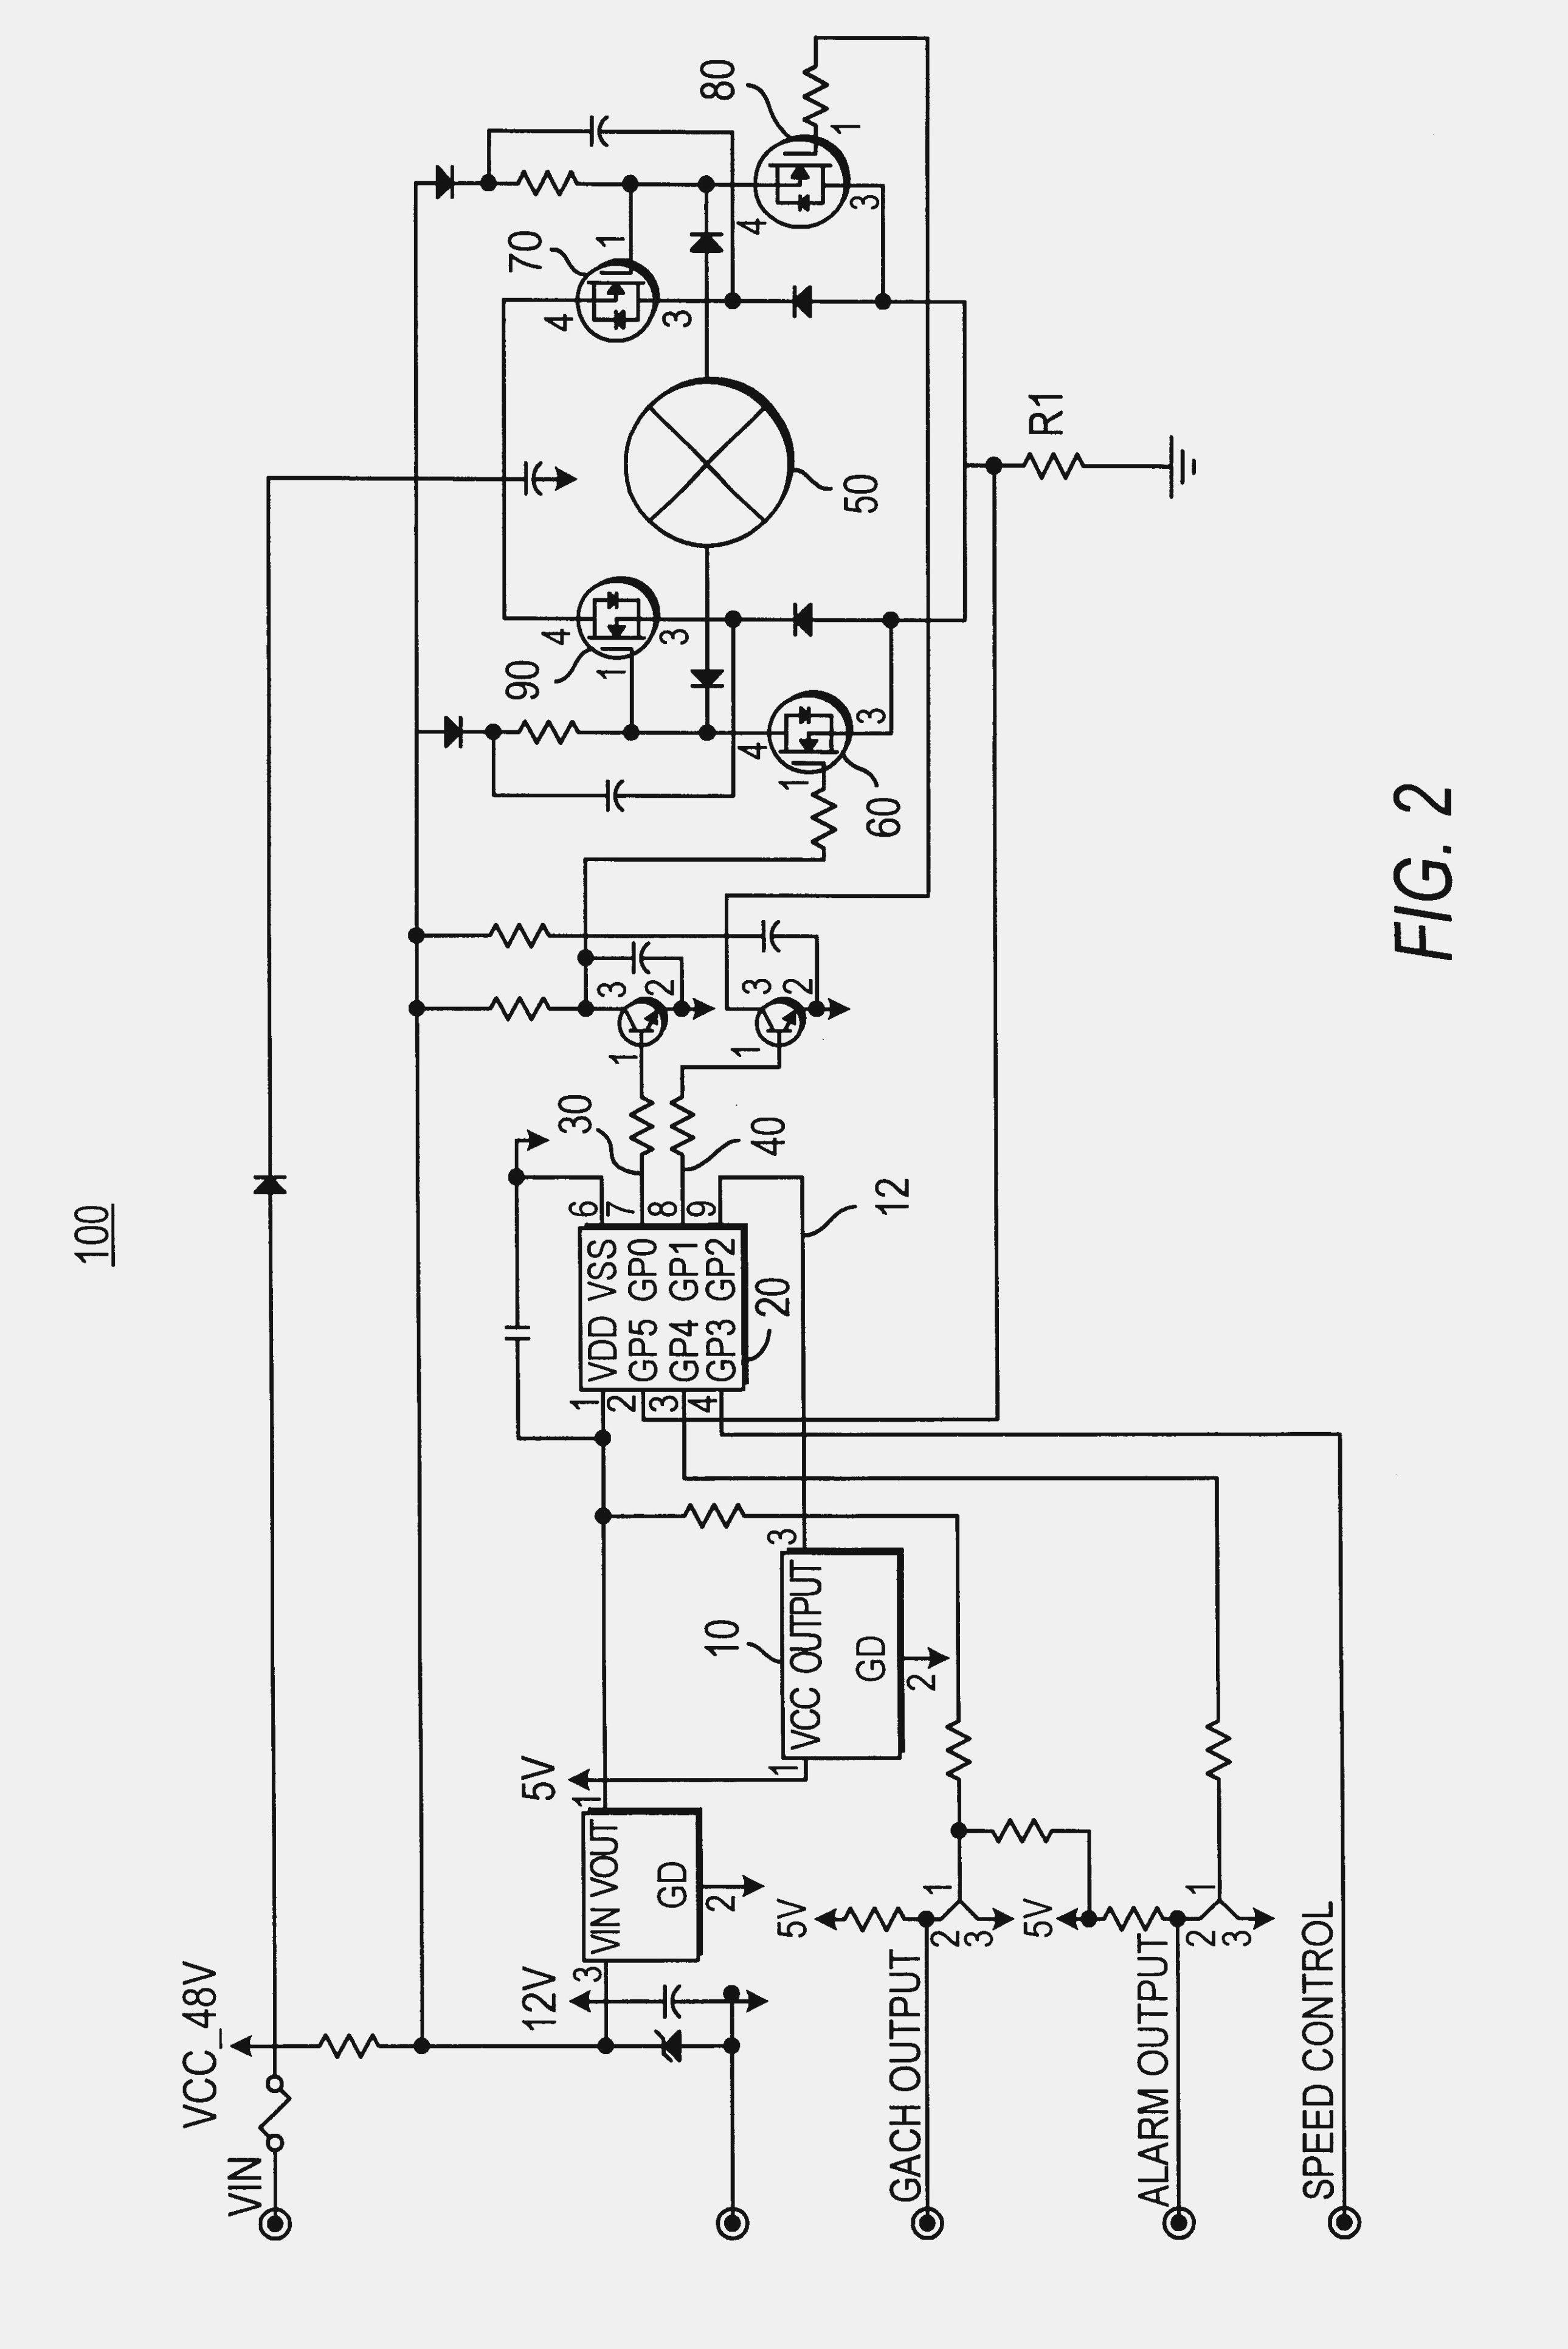 Unique Control Wiring Diagram Wiringdiagram Diagramming Diagramm Visuals Visualisation Graphical Diagram Wire Control